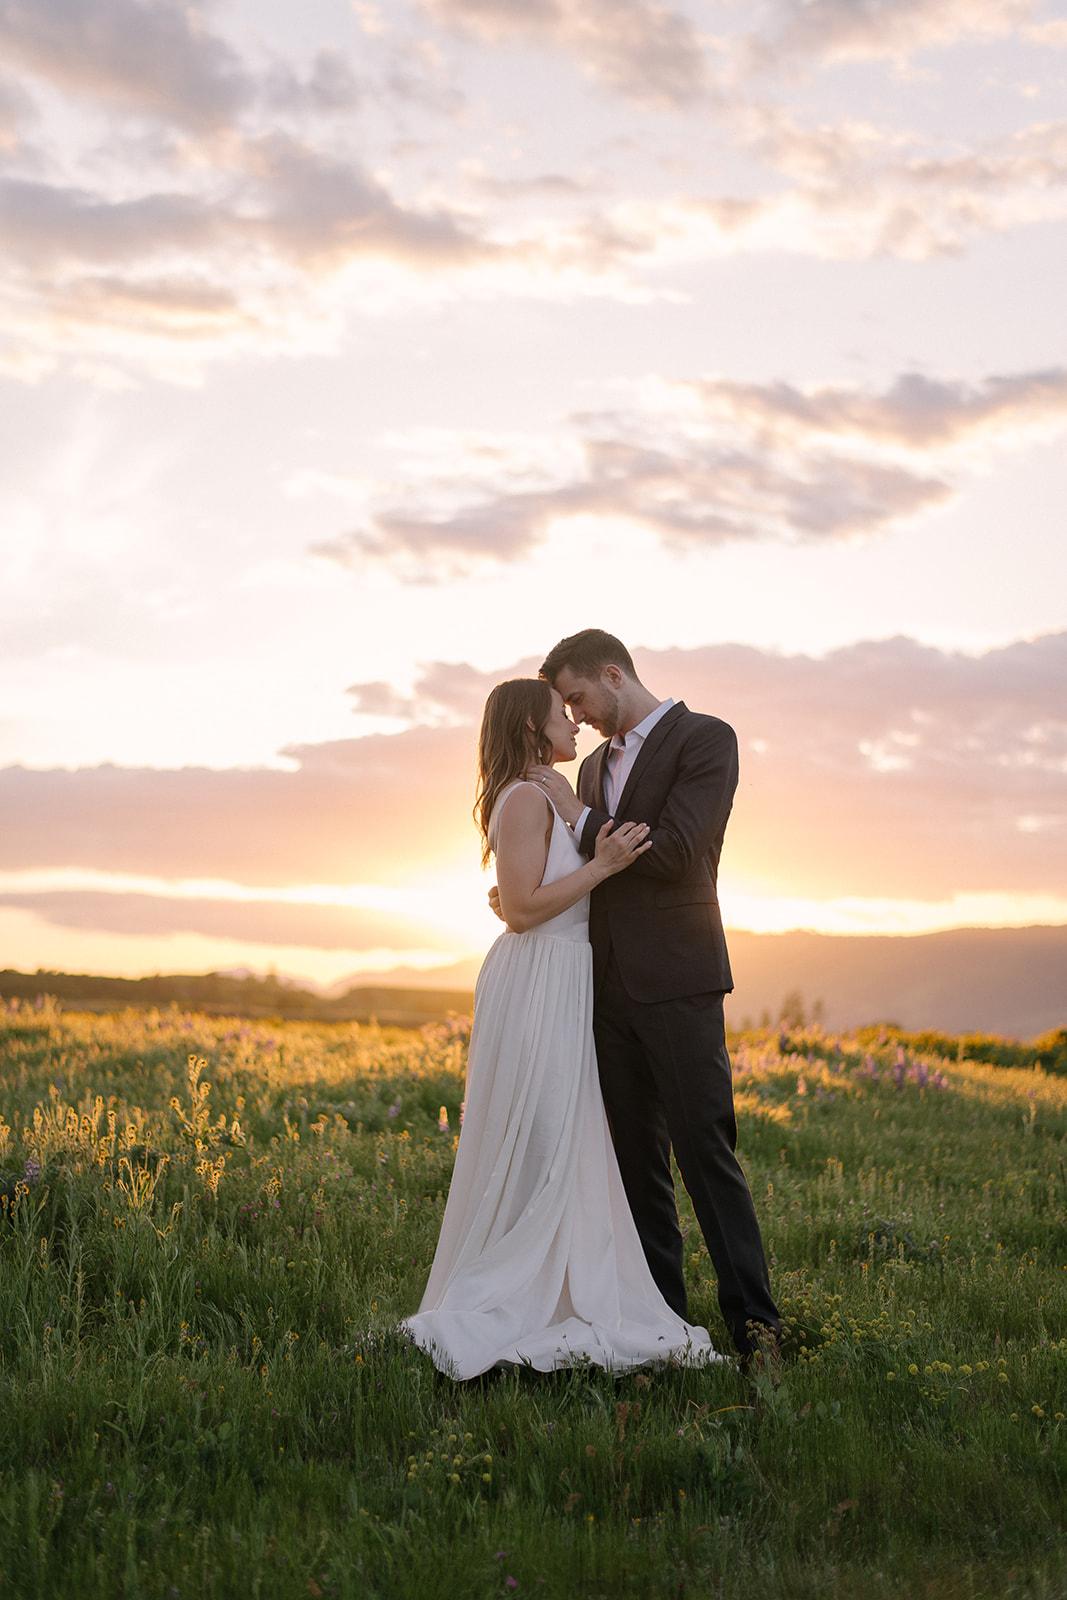 kamea_events_wedding_planner_portland_DeusAmor104.jpg